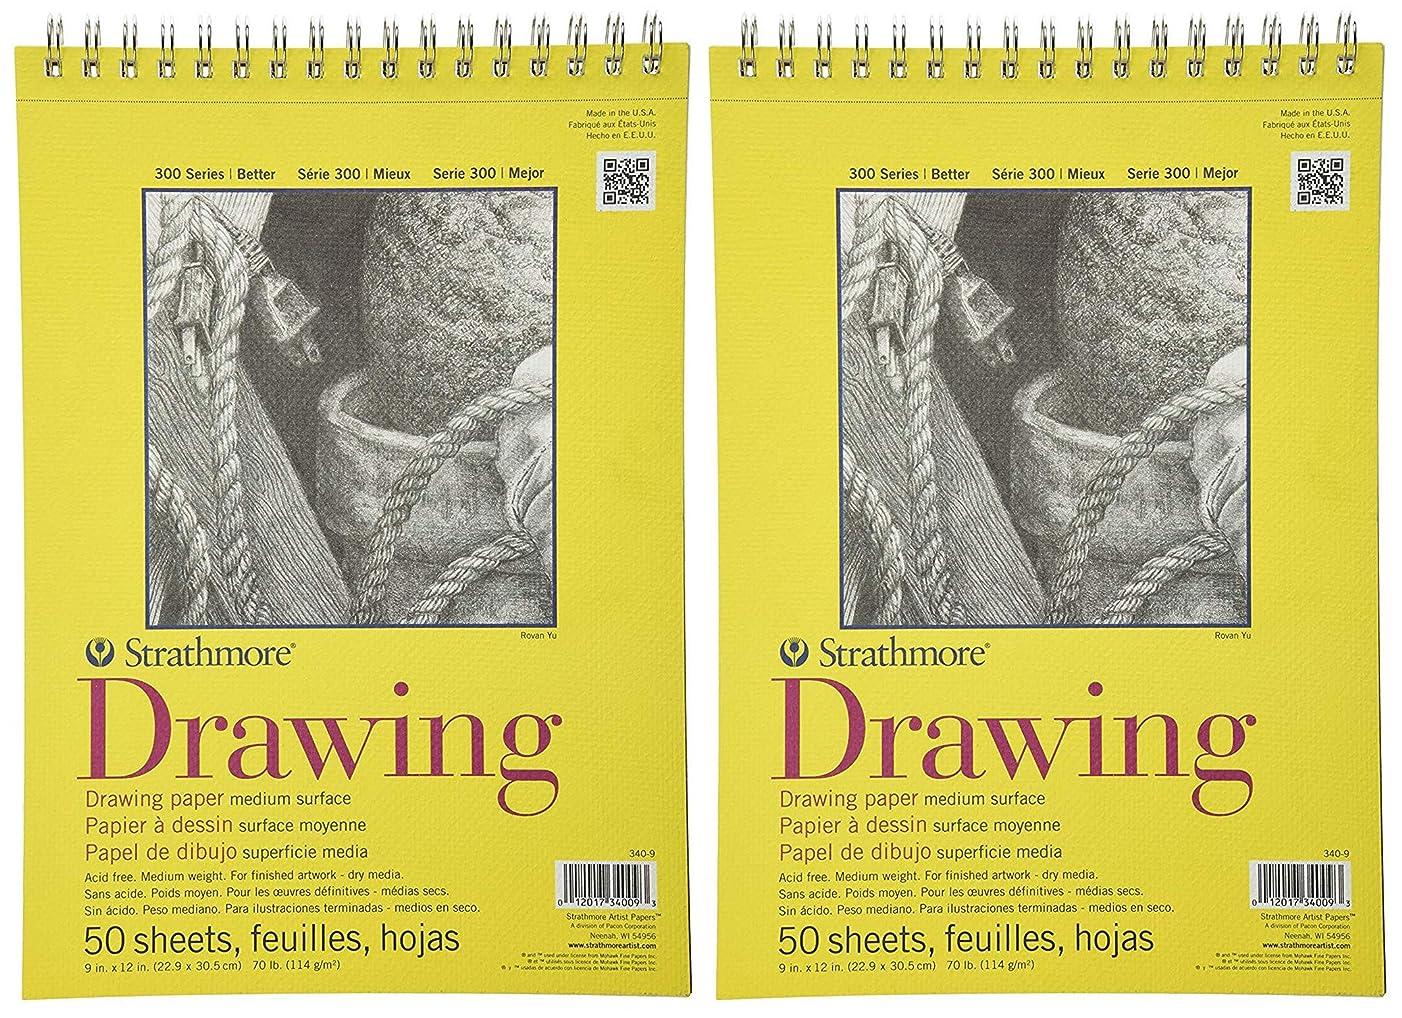 2-Pack - Strathmore 300 Series Drawing Pad, Medium Surface, 9